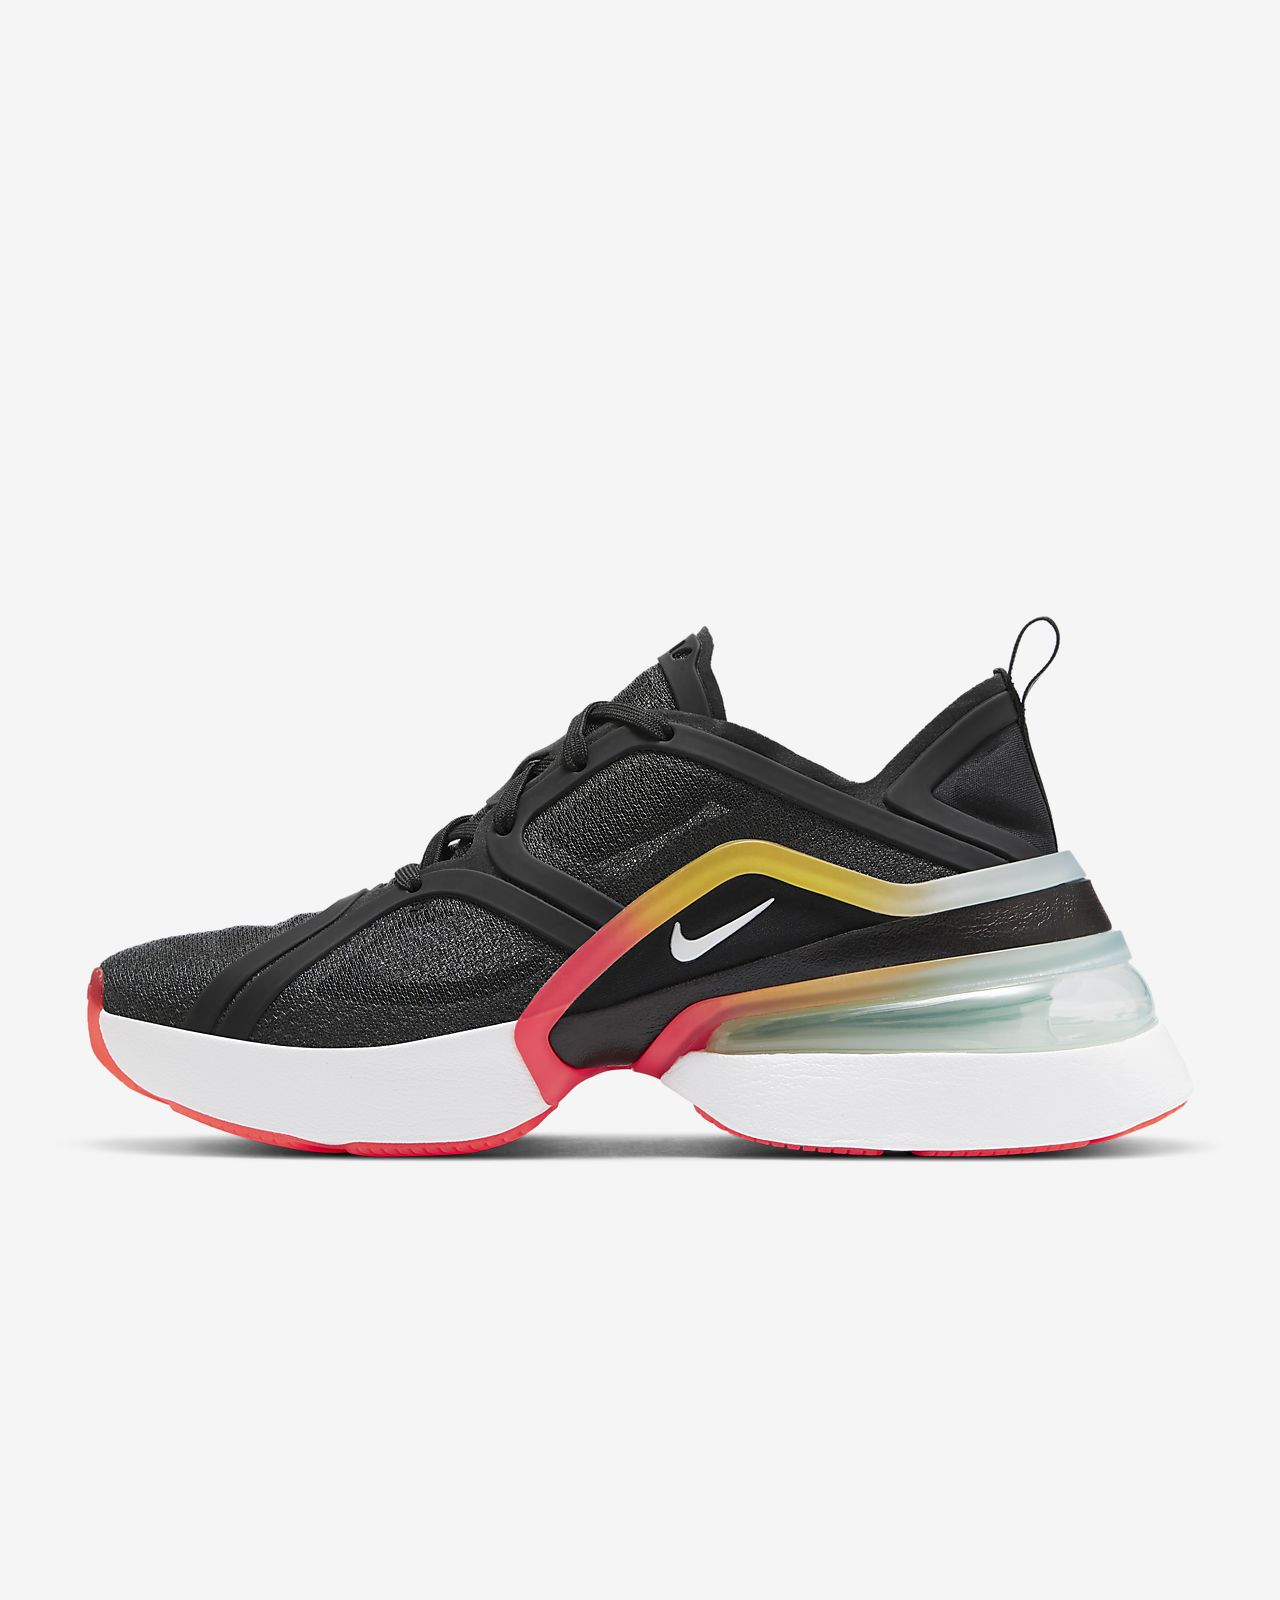 Nike Air Max 270 XX 女子运动鞋